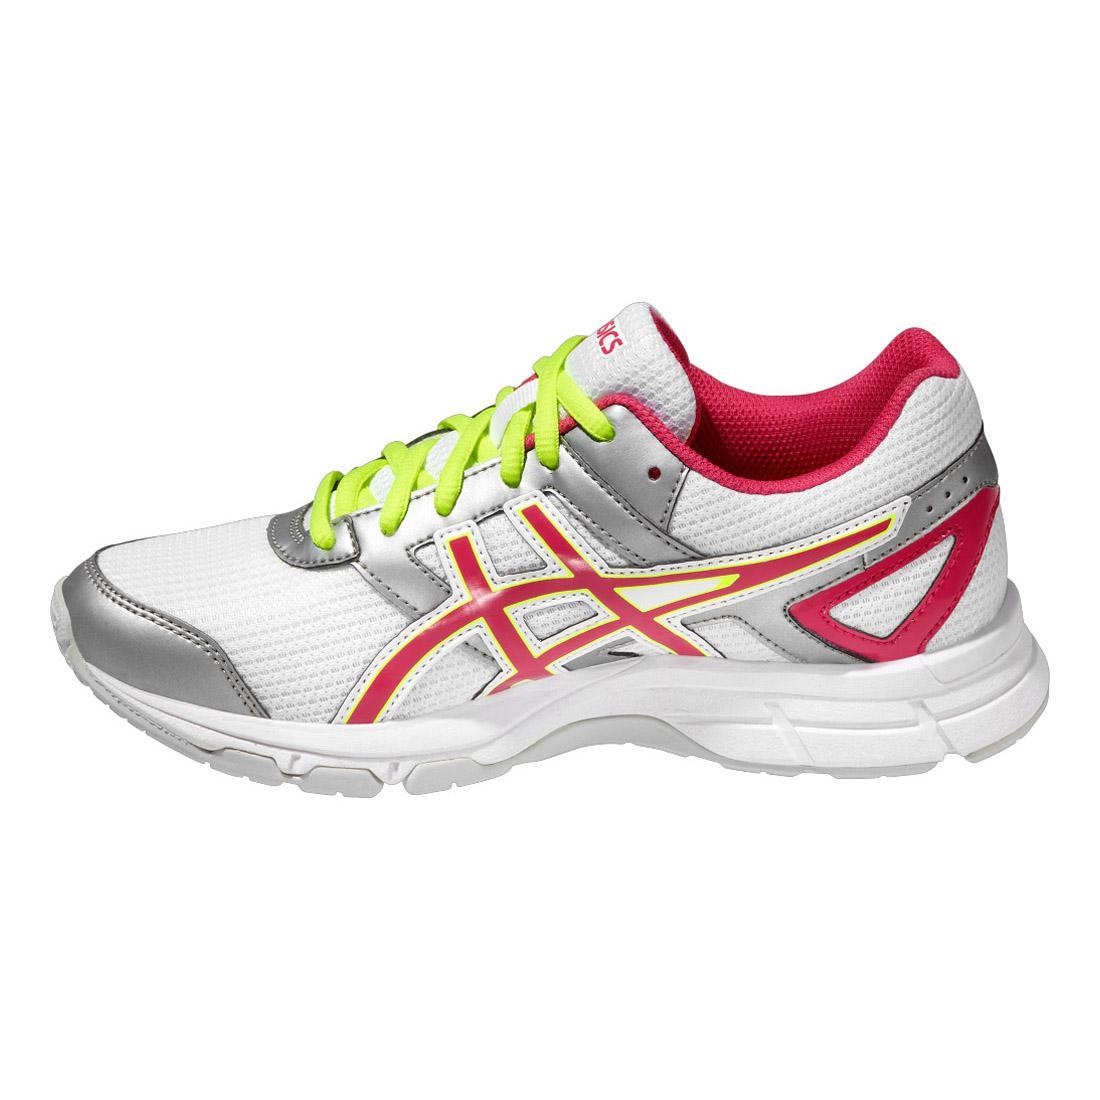 Asics Kids GEL-Galaxy 8 GS Running Shoes - White Pink - Tennisnuts.com 106f700d12